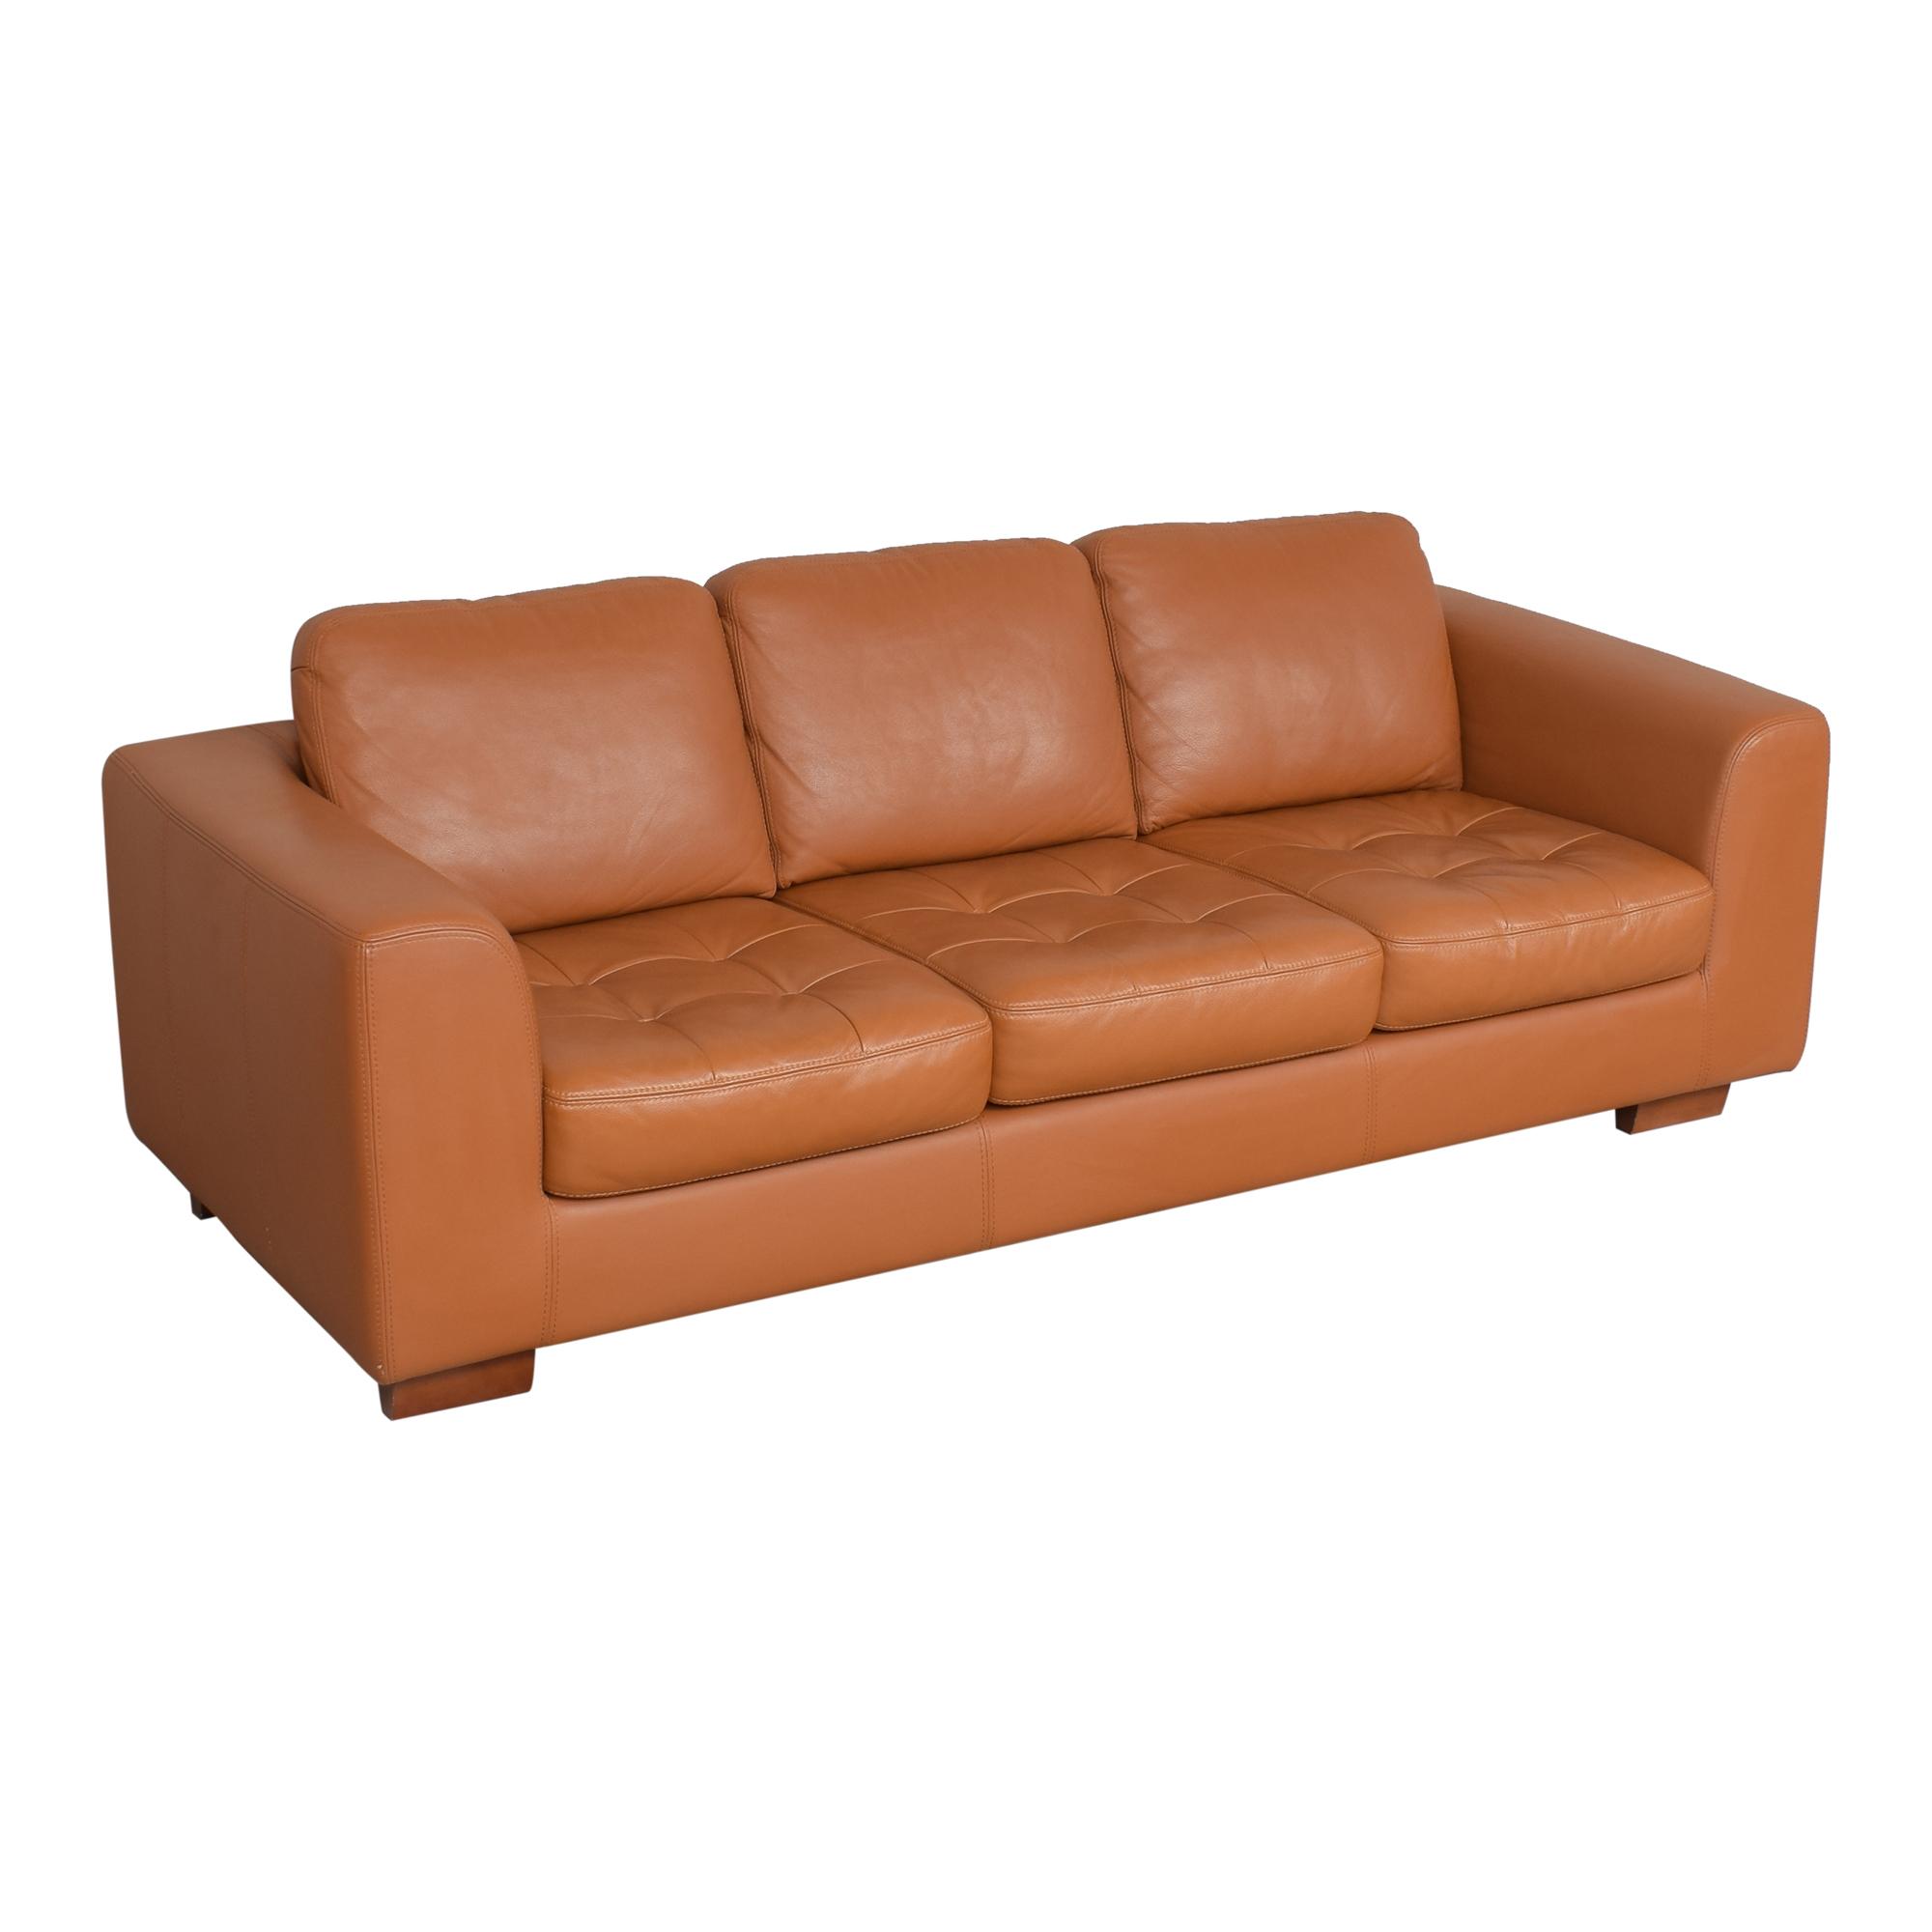 W. Schillig W. Schillig Three Cushion Sofa pa